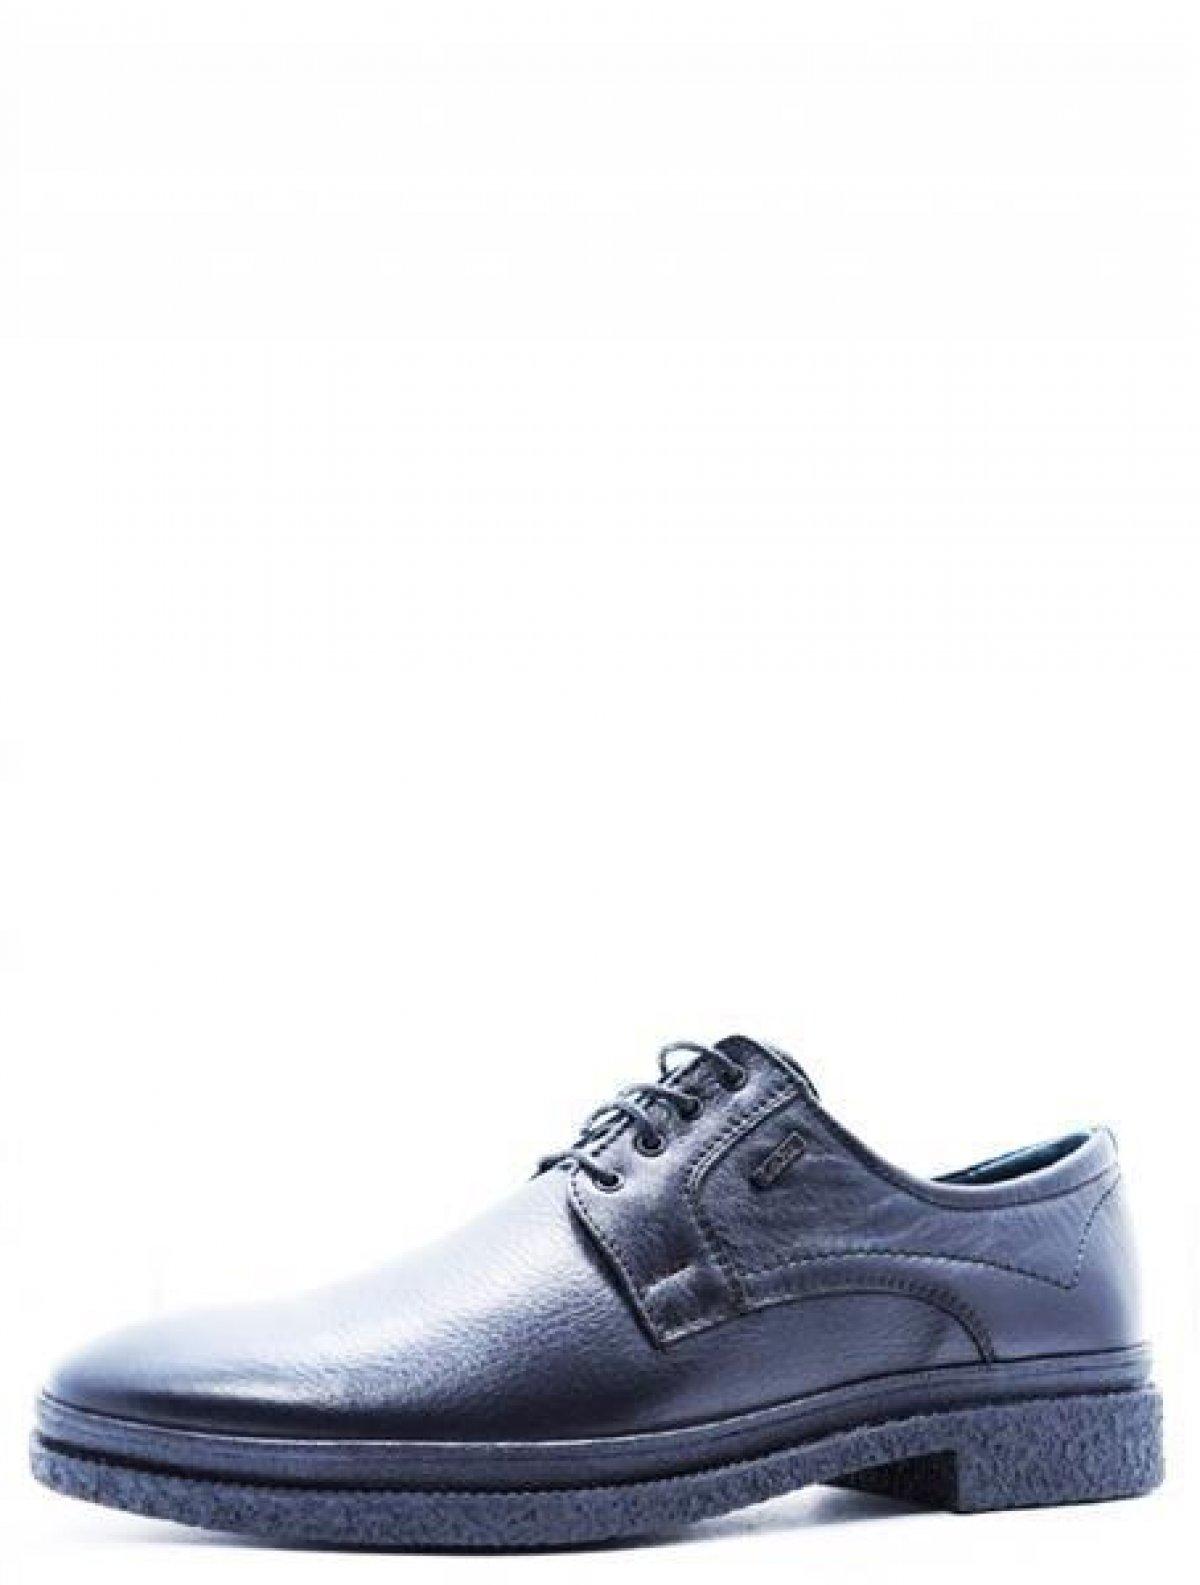 LEGRE 685.118.000.424 мужские туфли